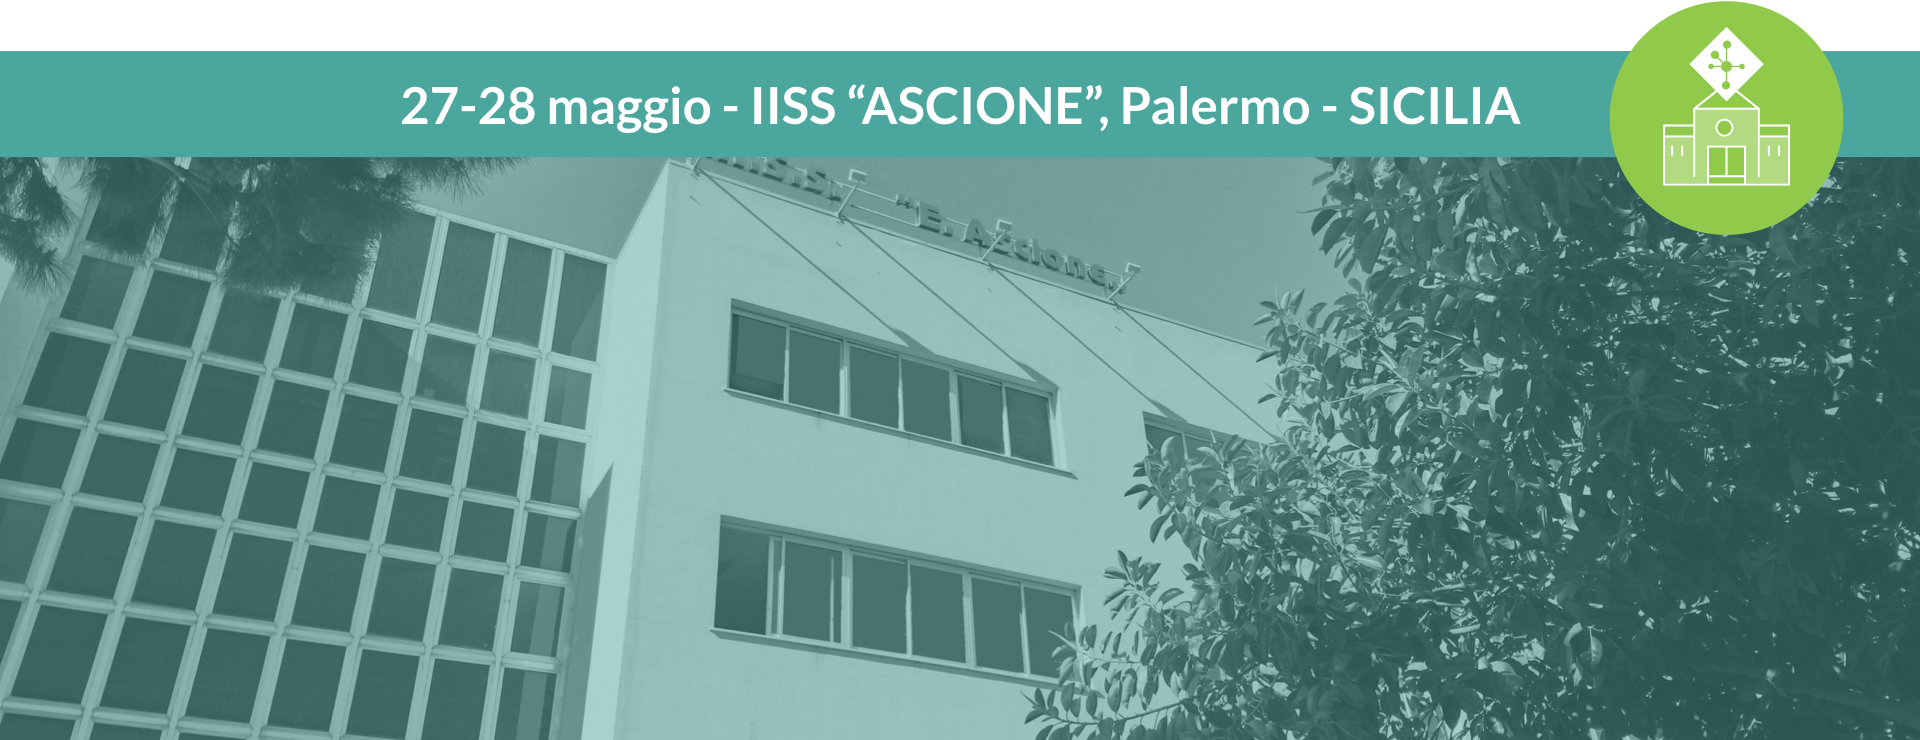 ascione_icona